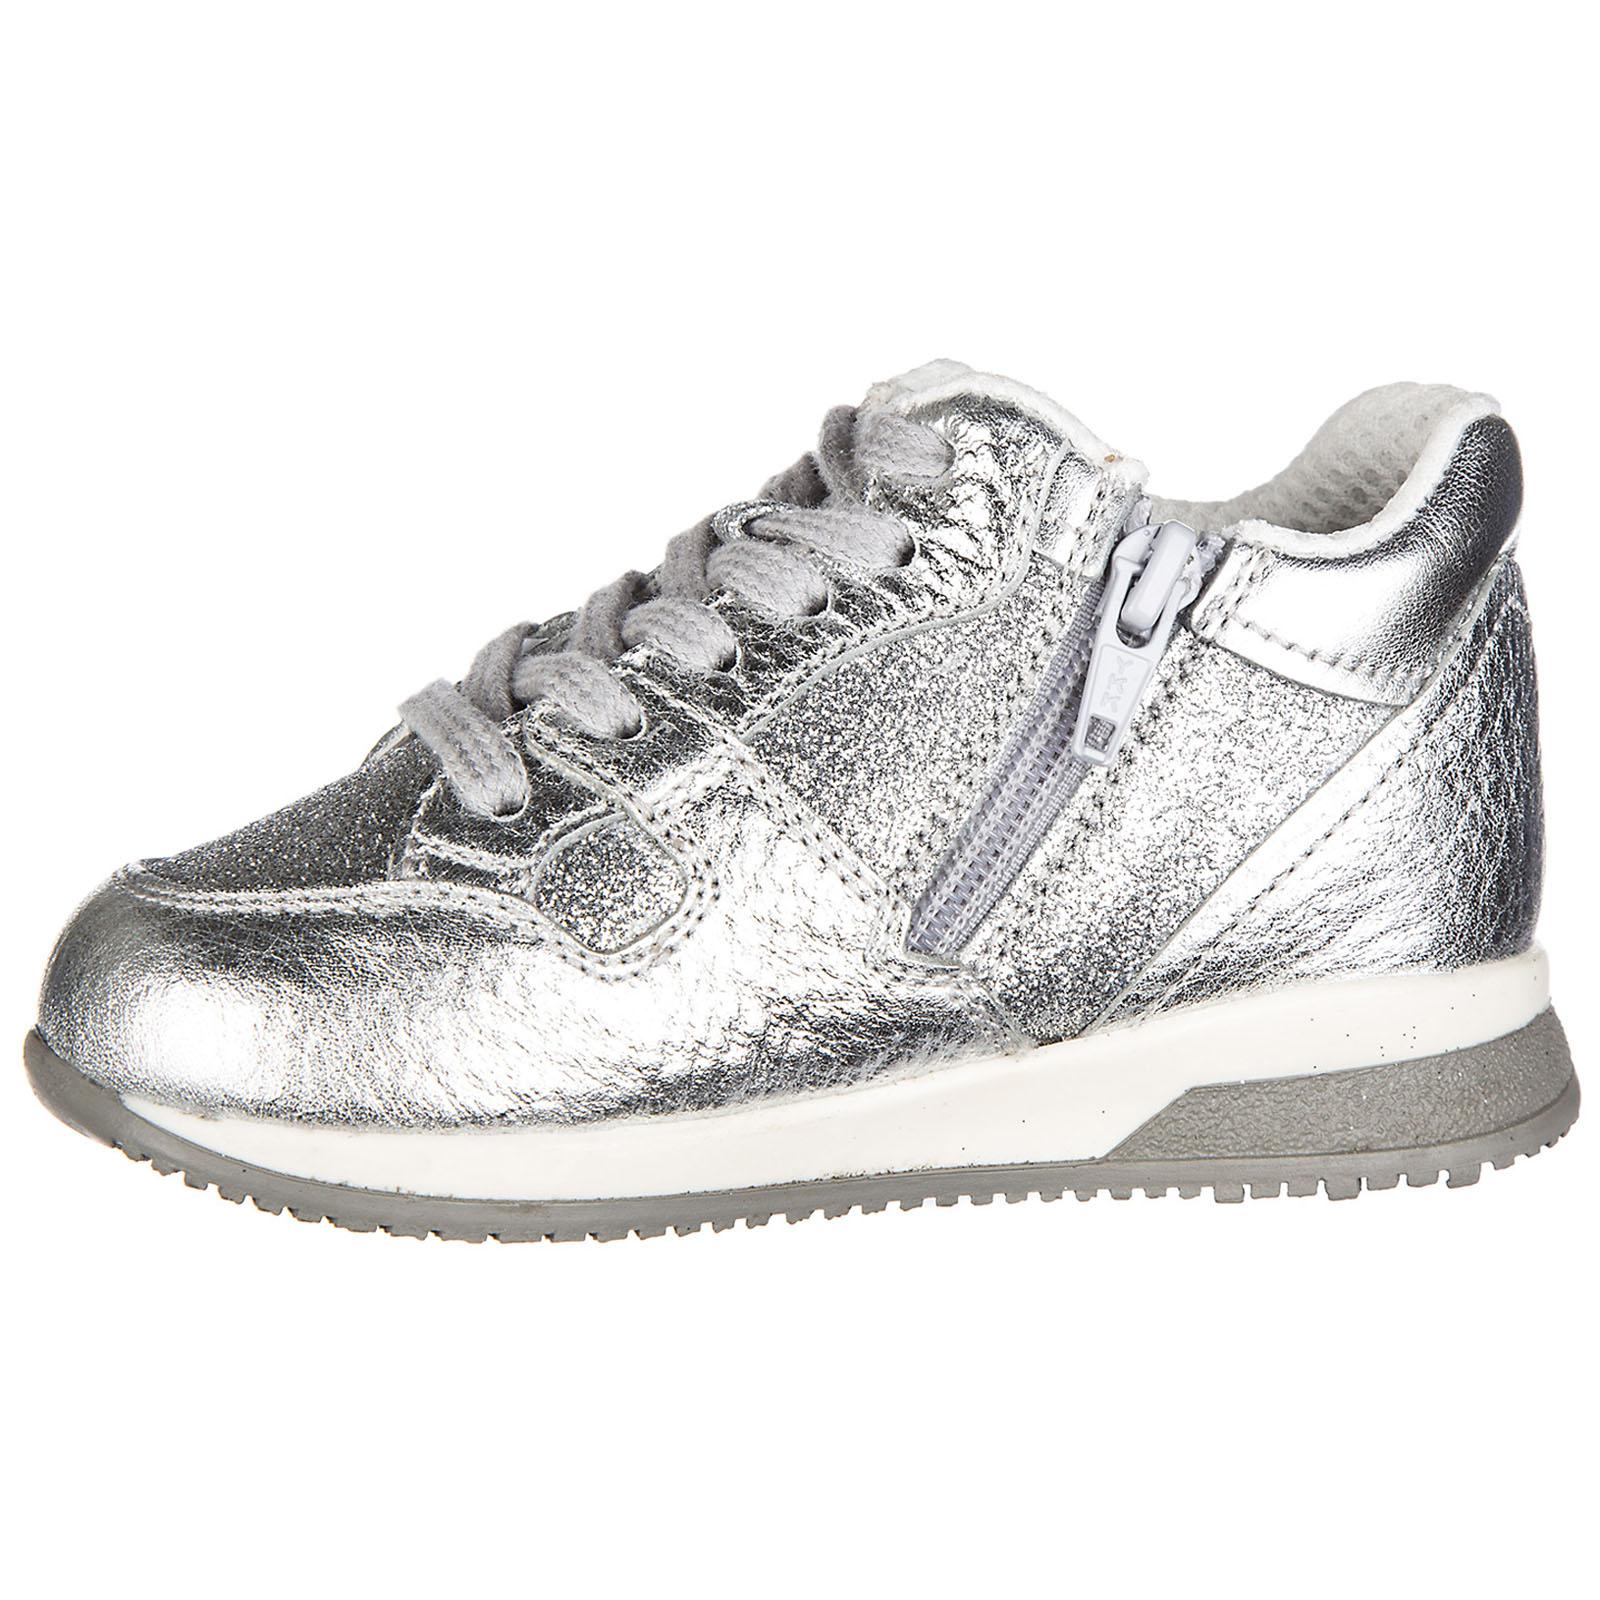 84f3485175c8ec ... Scarpe sneakers bimba bambina pelle elective h grande zip ...